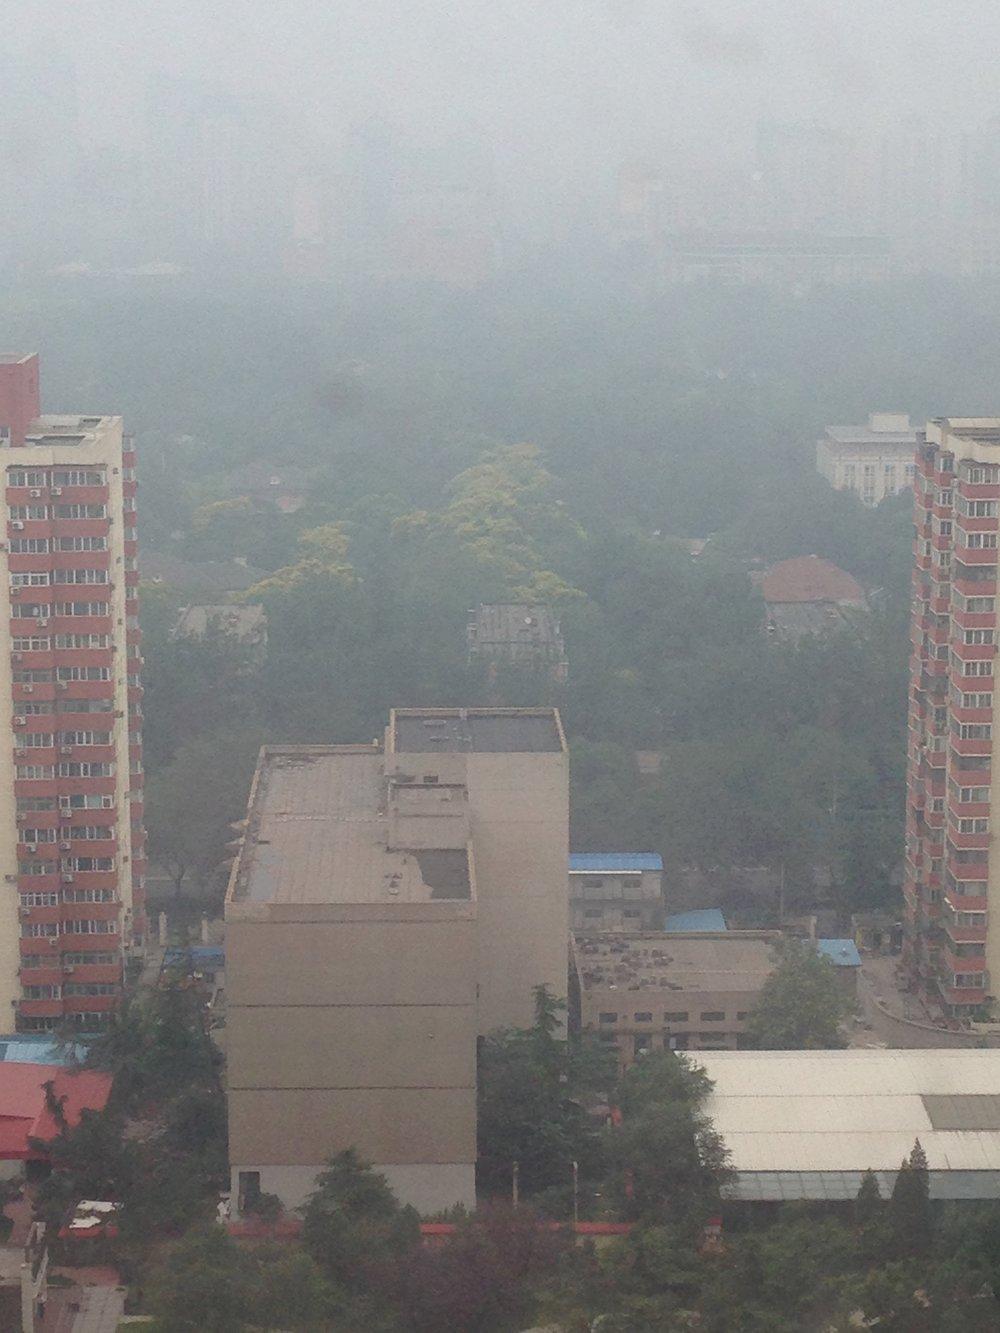 Heavy smog blankets Ritan Park